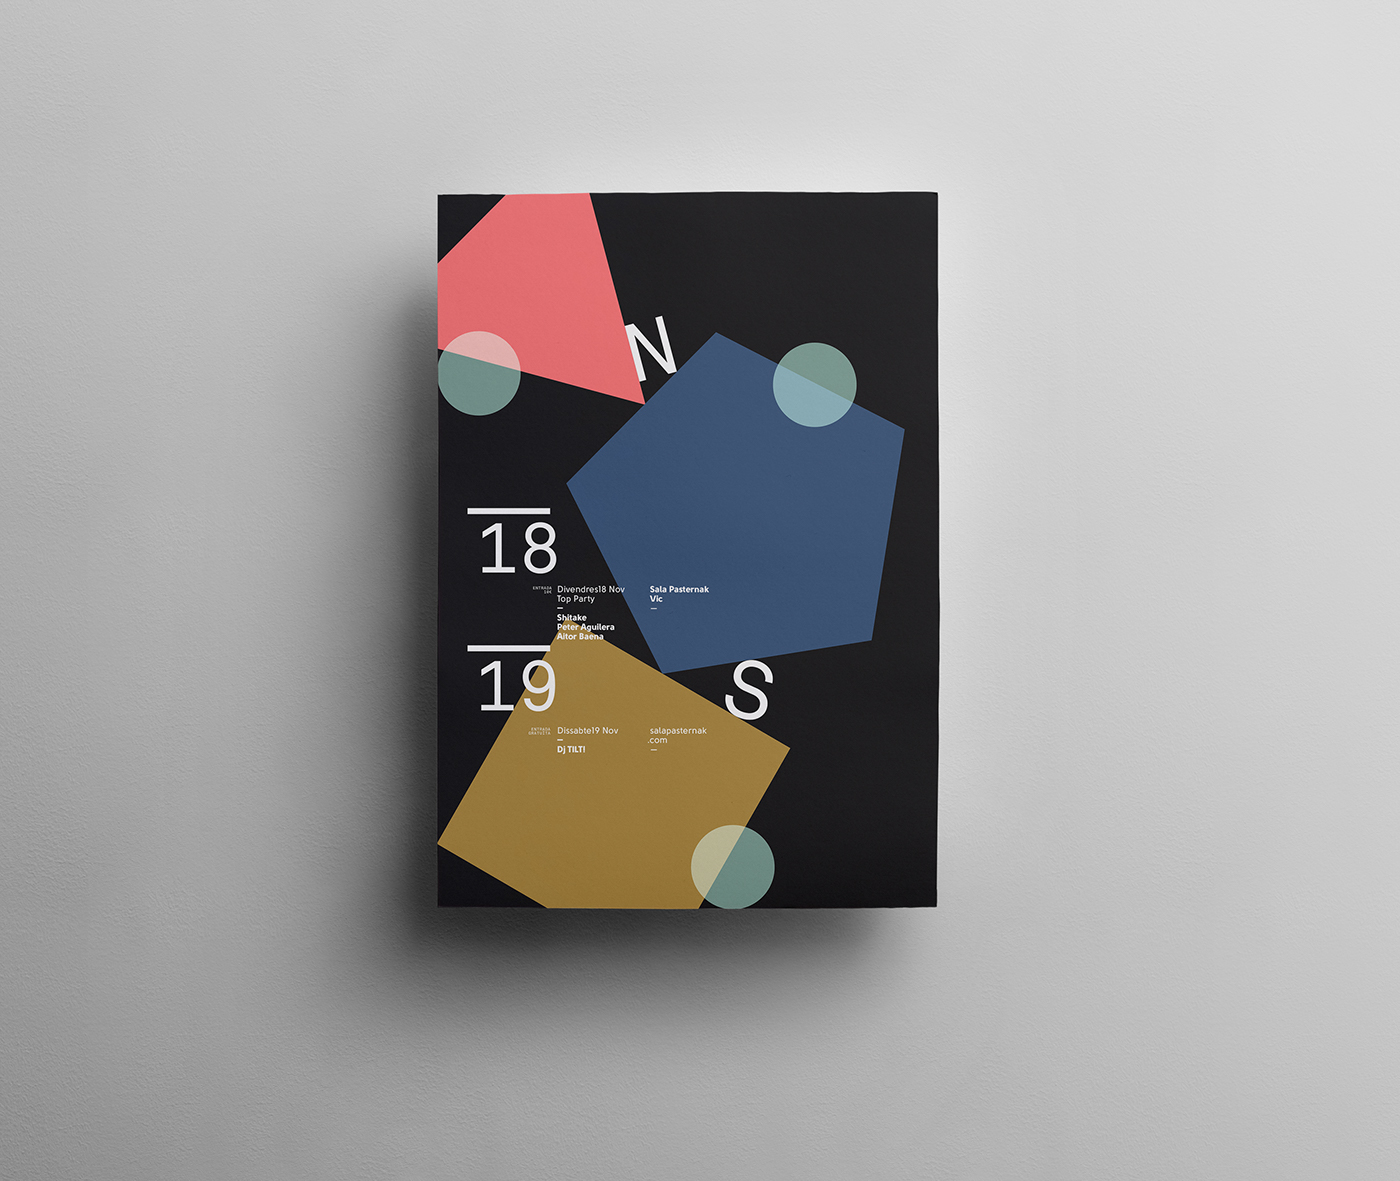 poster design Original barcelona quimmarin